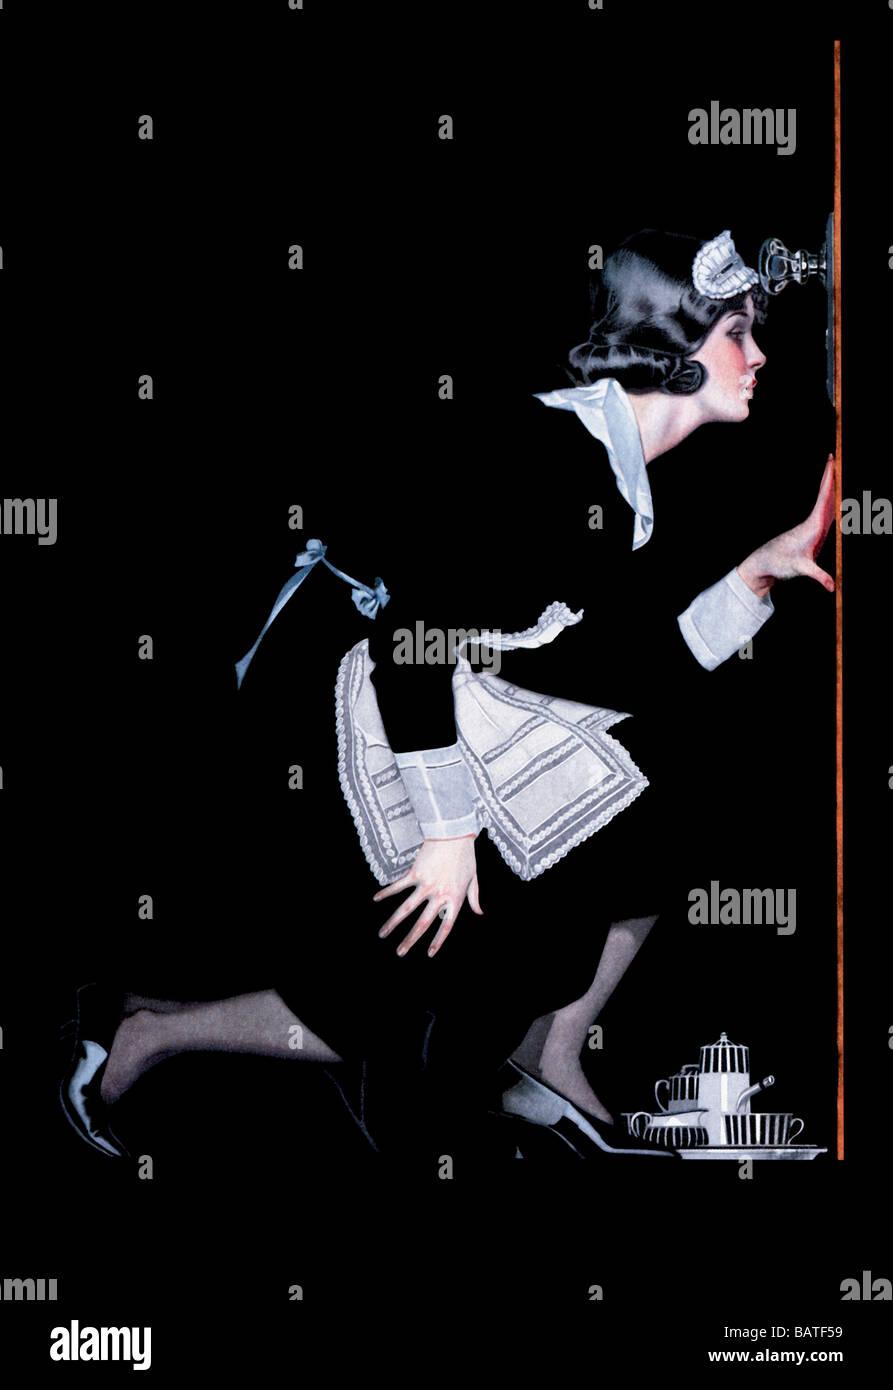 Maid to Spy - Stock Image